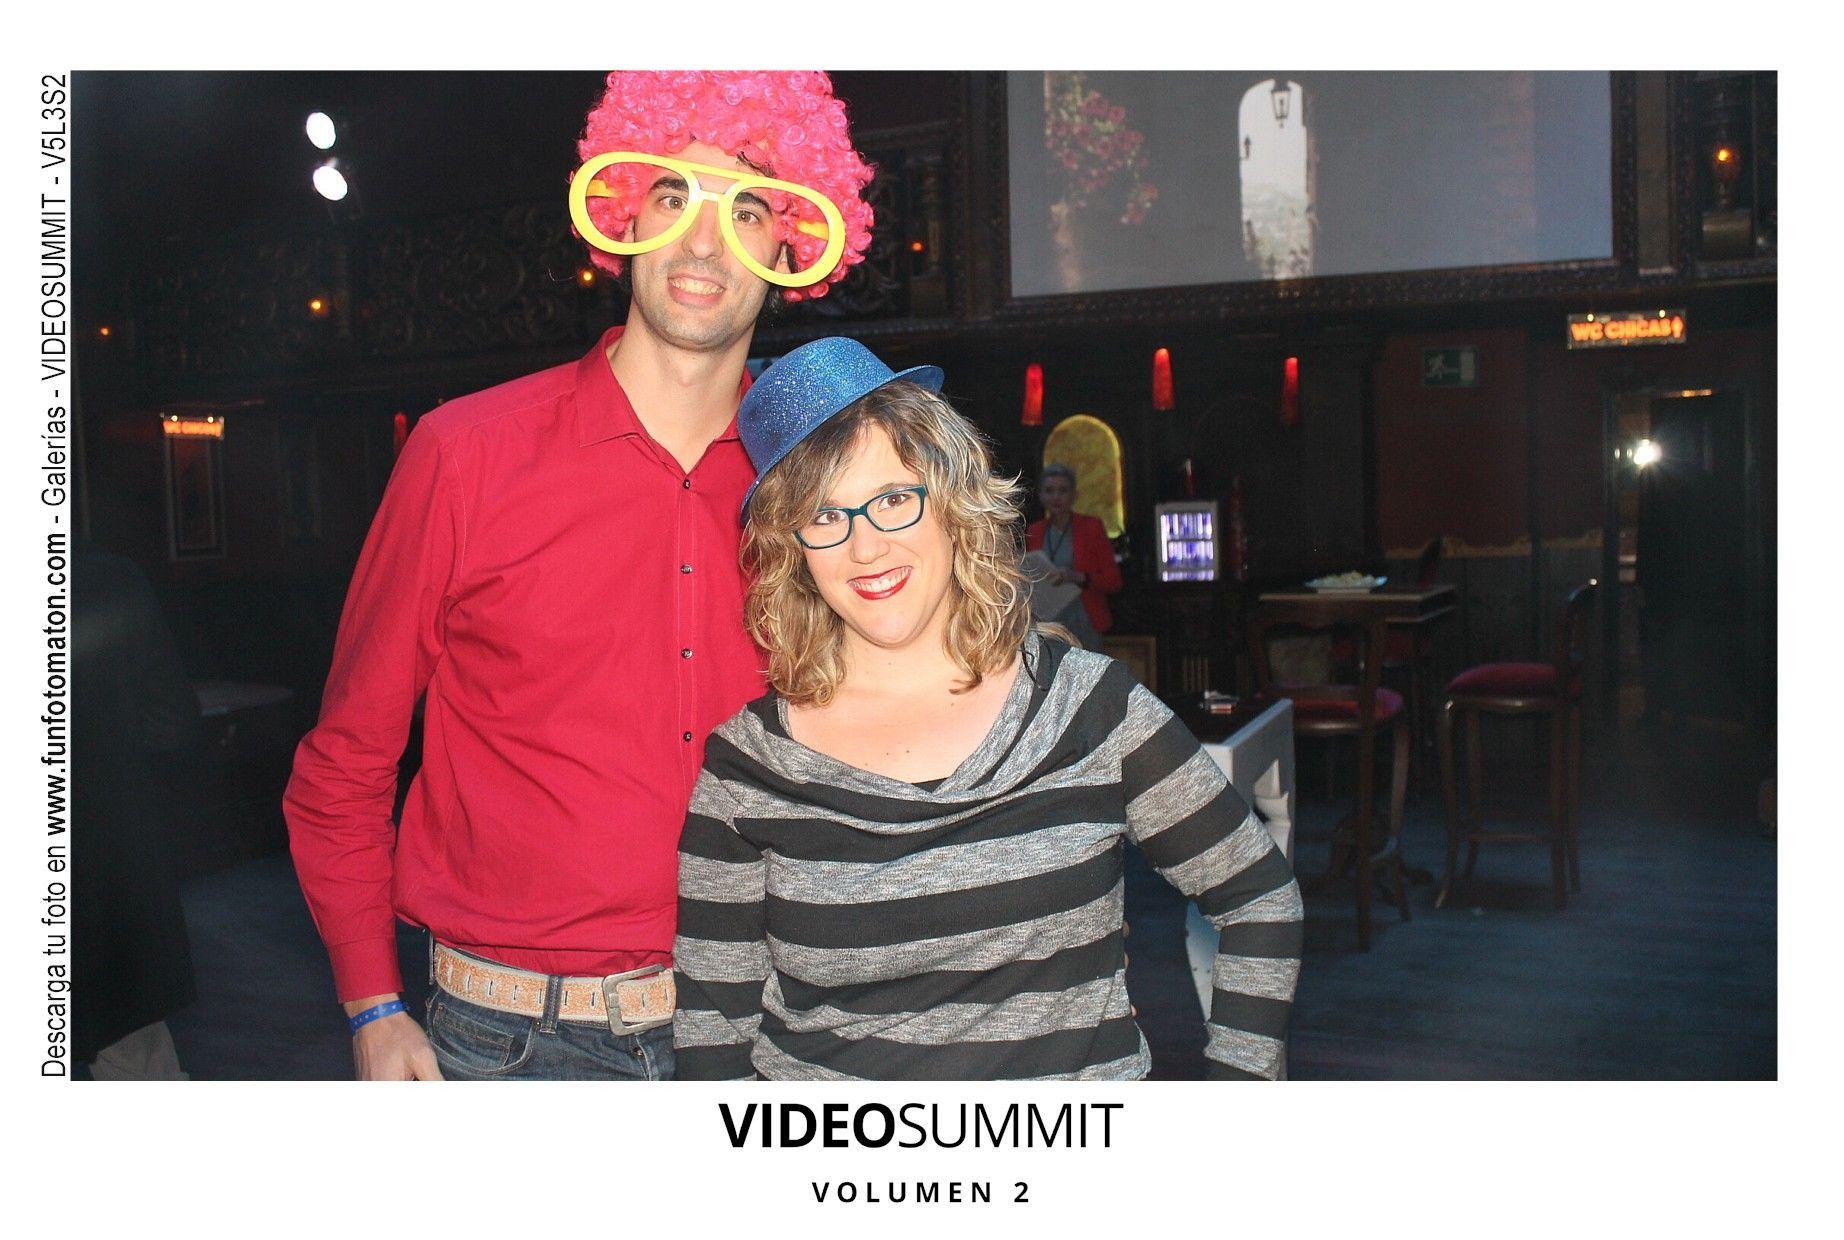 videosummit-vol2-club-party-077